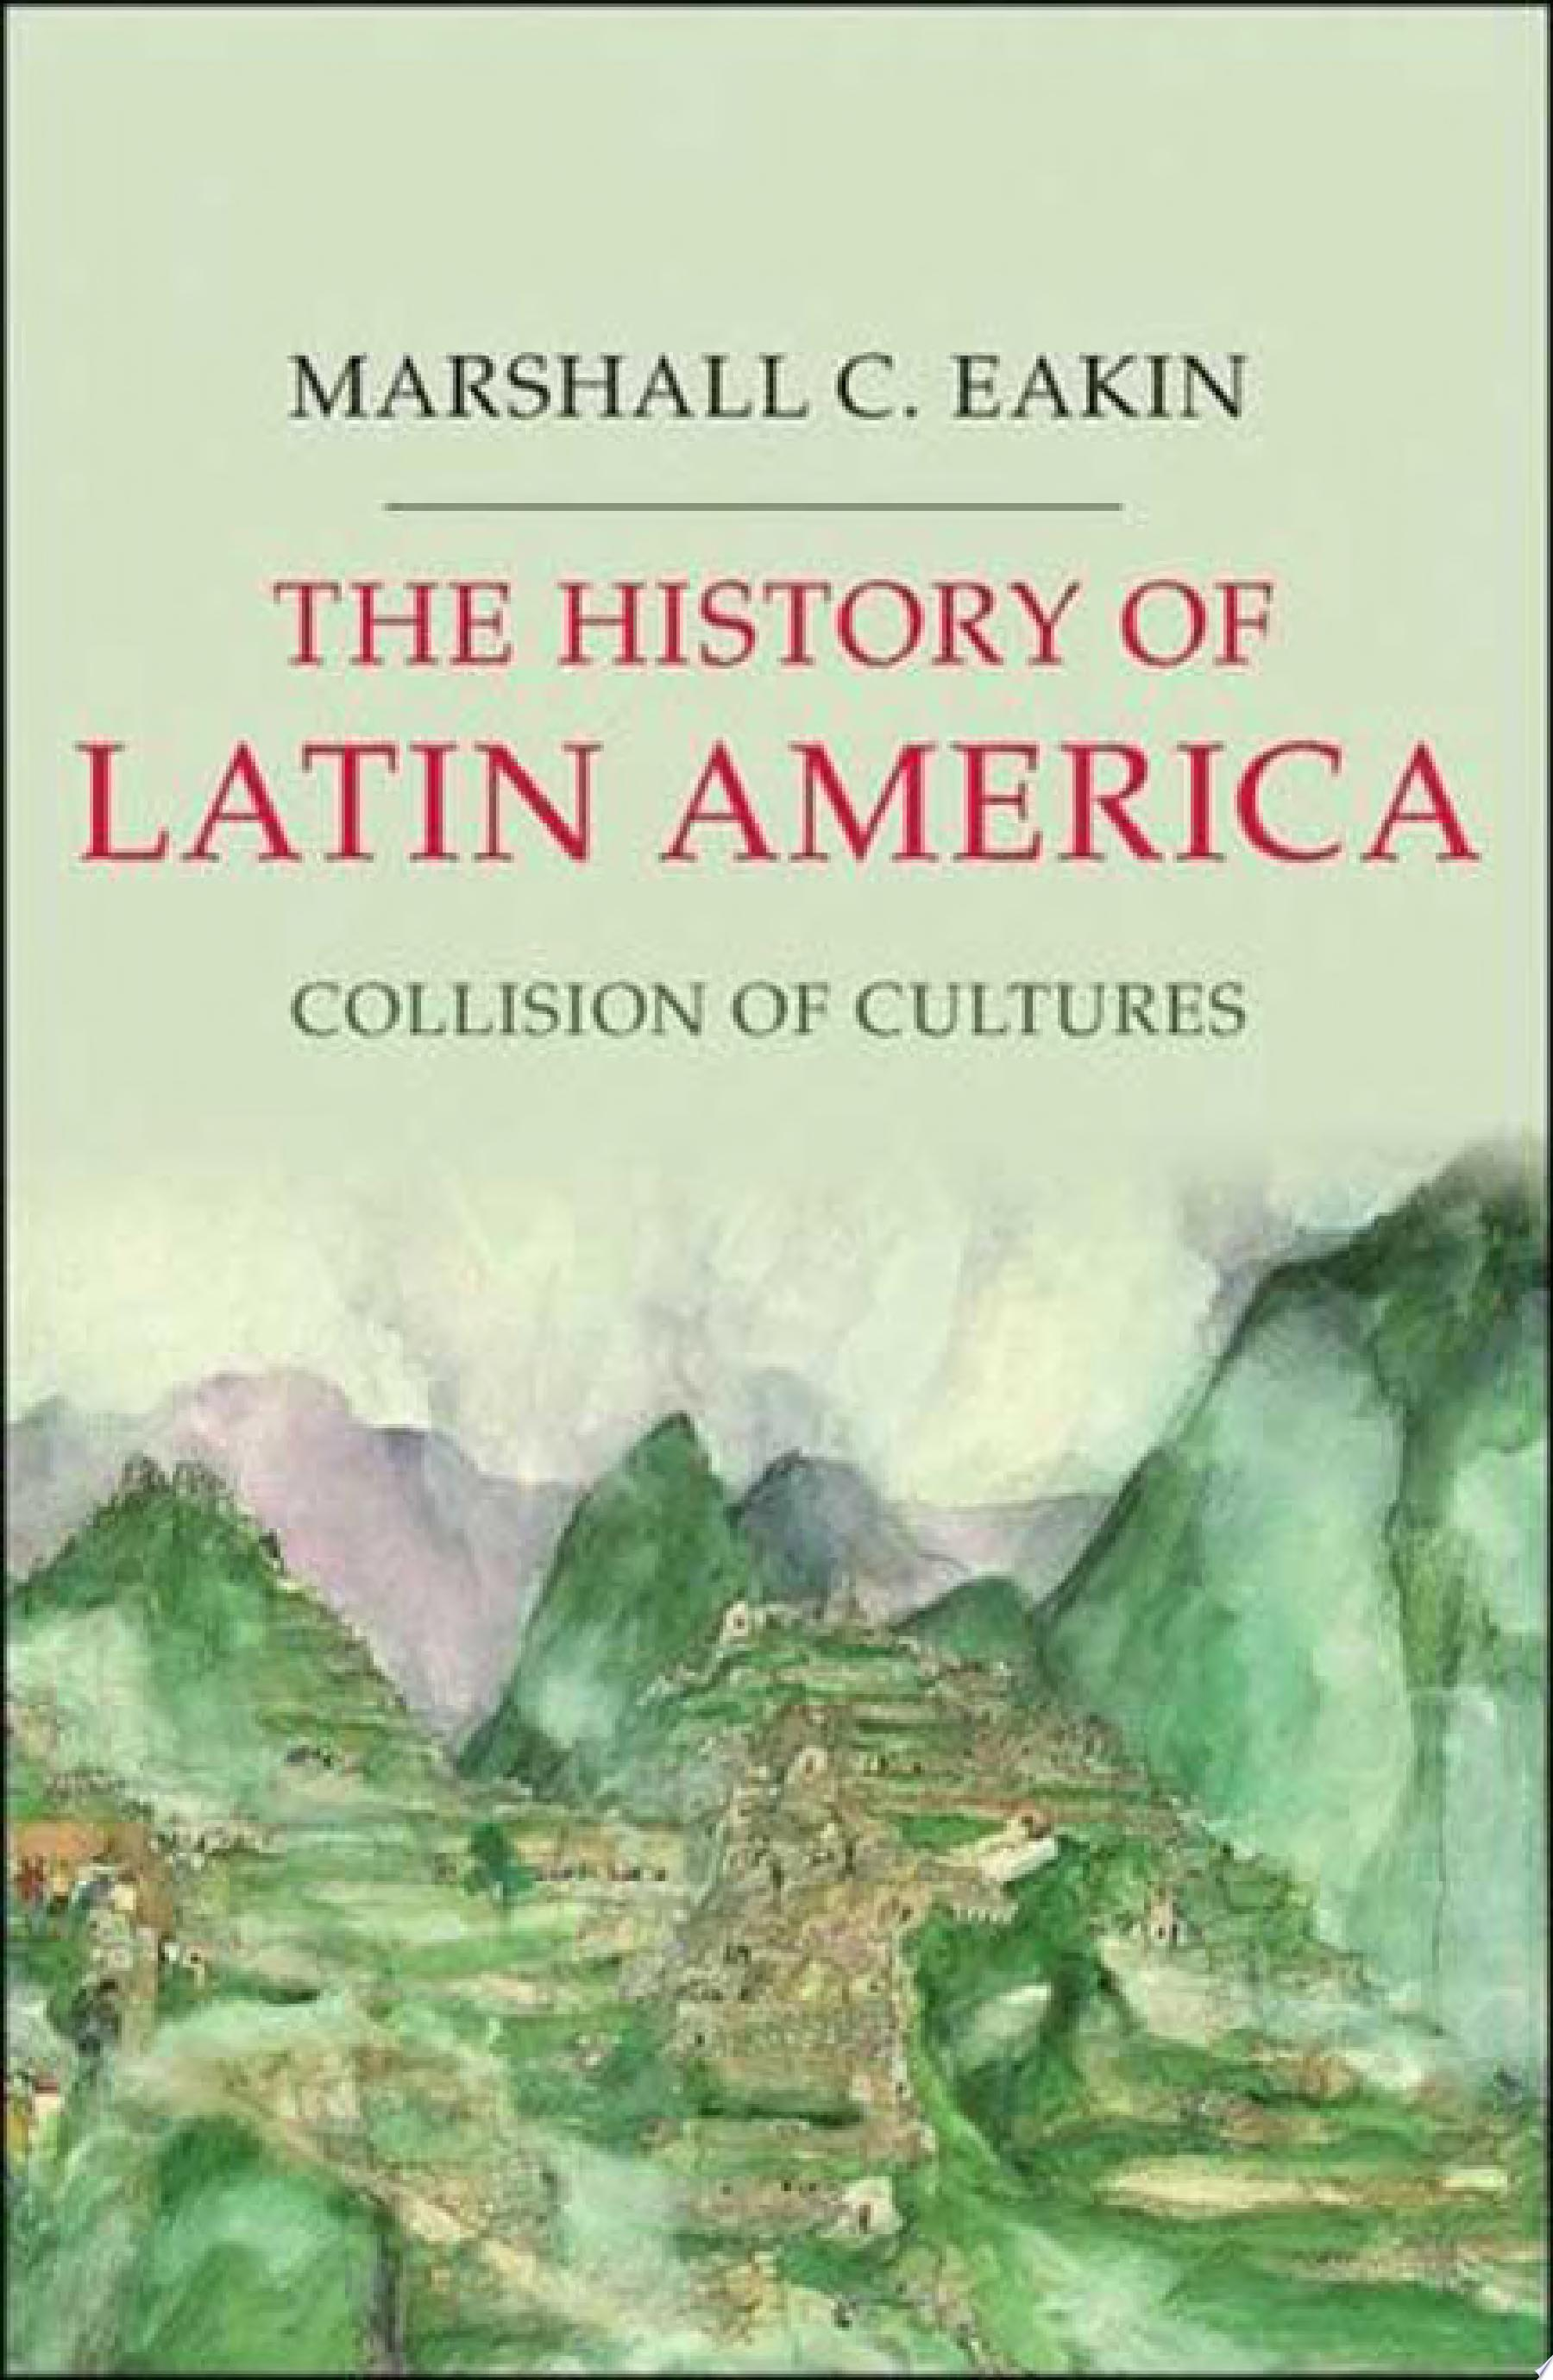 The History of Latin America